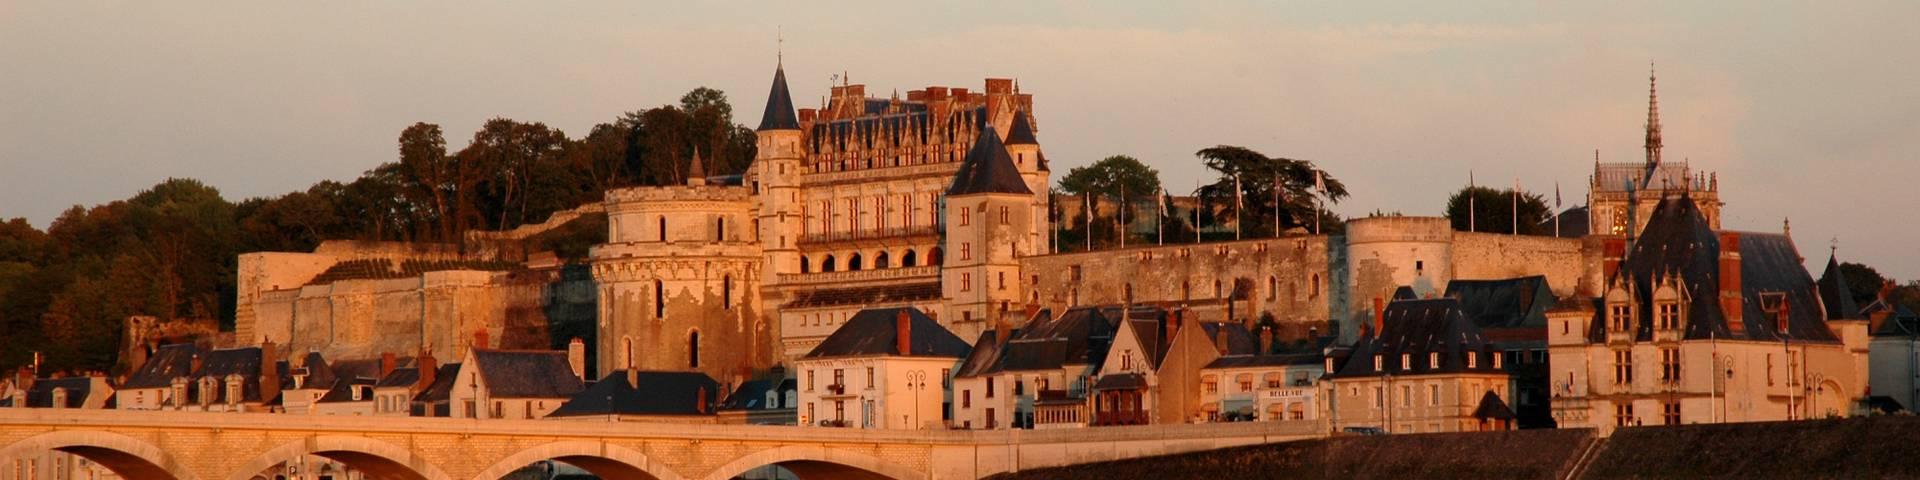 Magnífica vista del Castillo Real de Amboise. © JF Le Scour